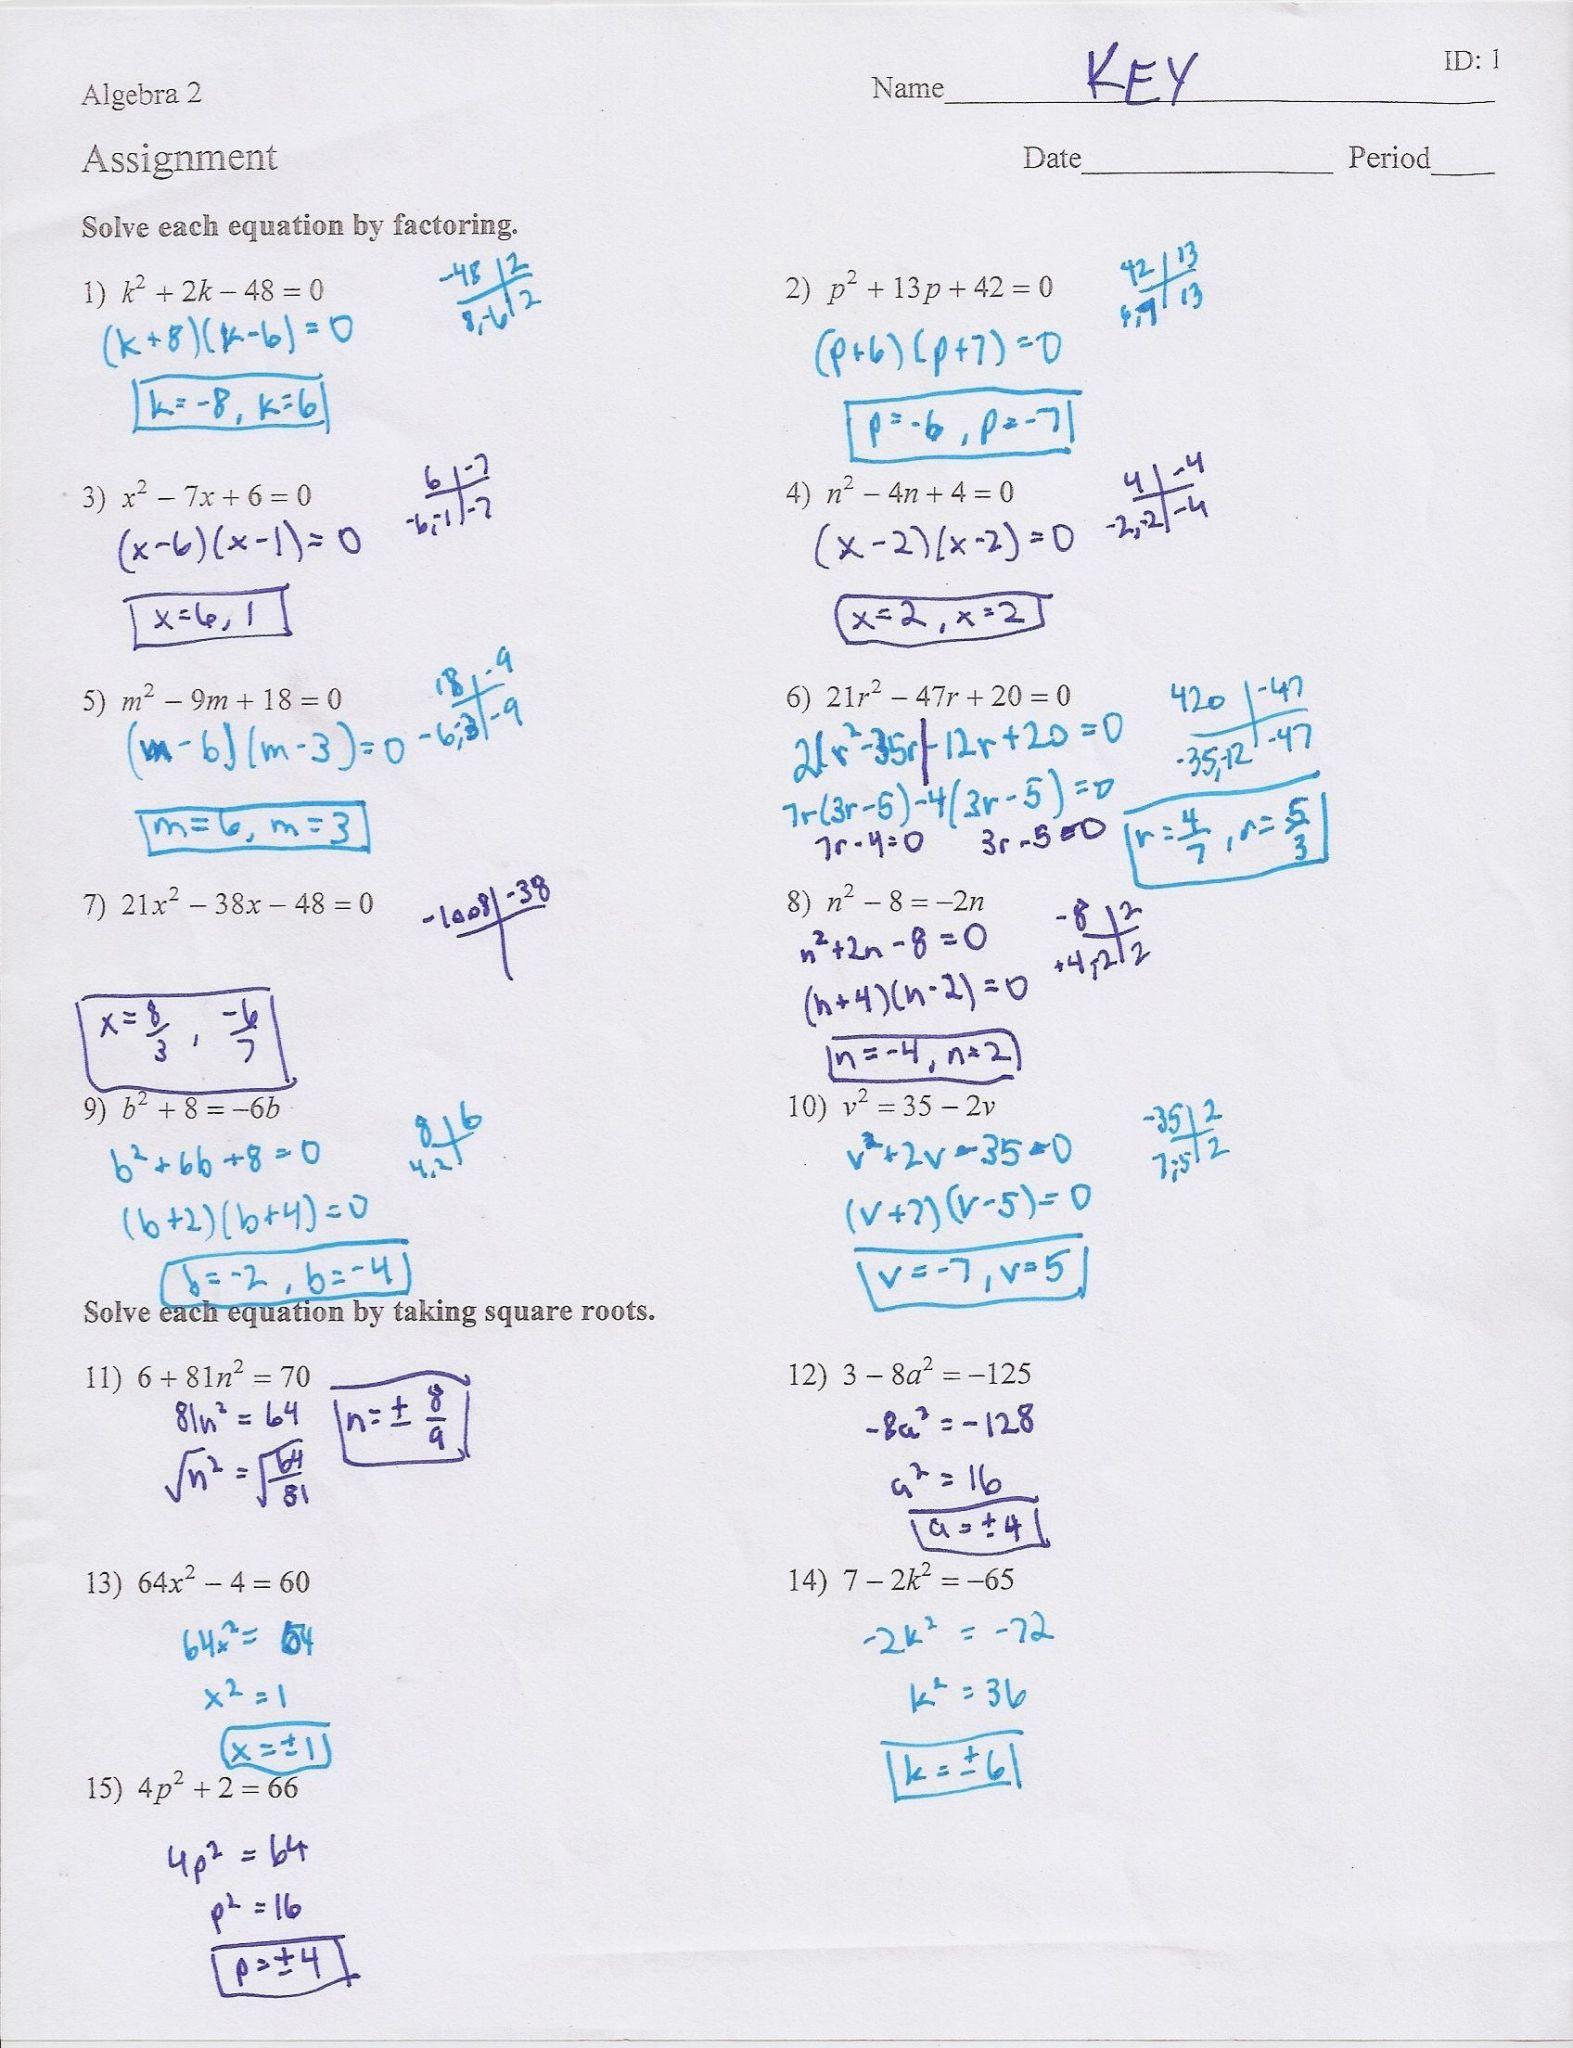 Quadratic Equation Worksheet with Answers Quadratic formula Worksheets Printable